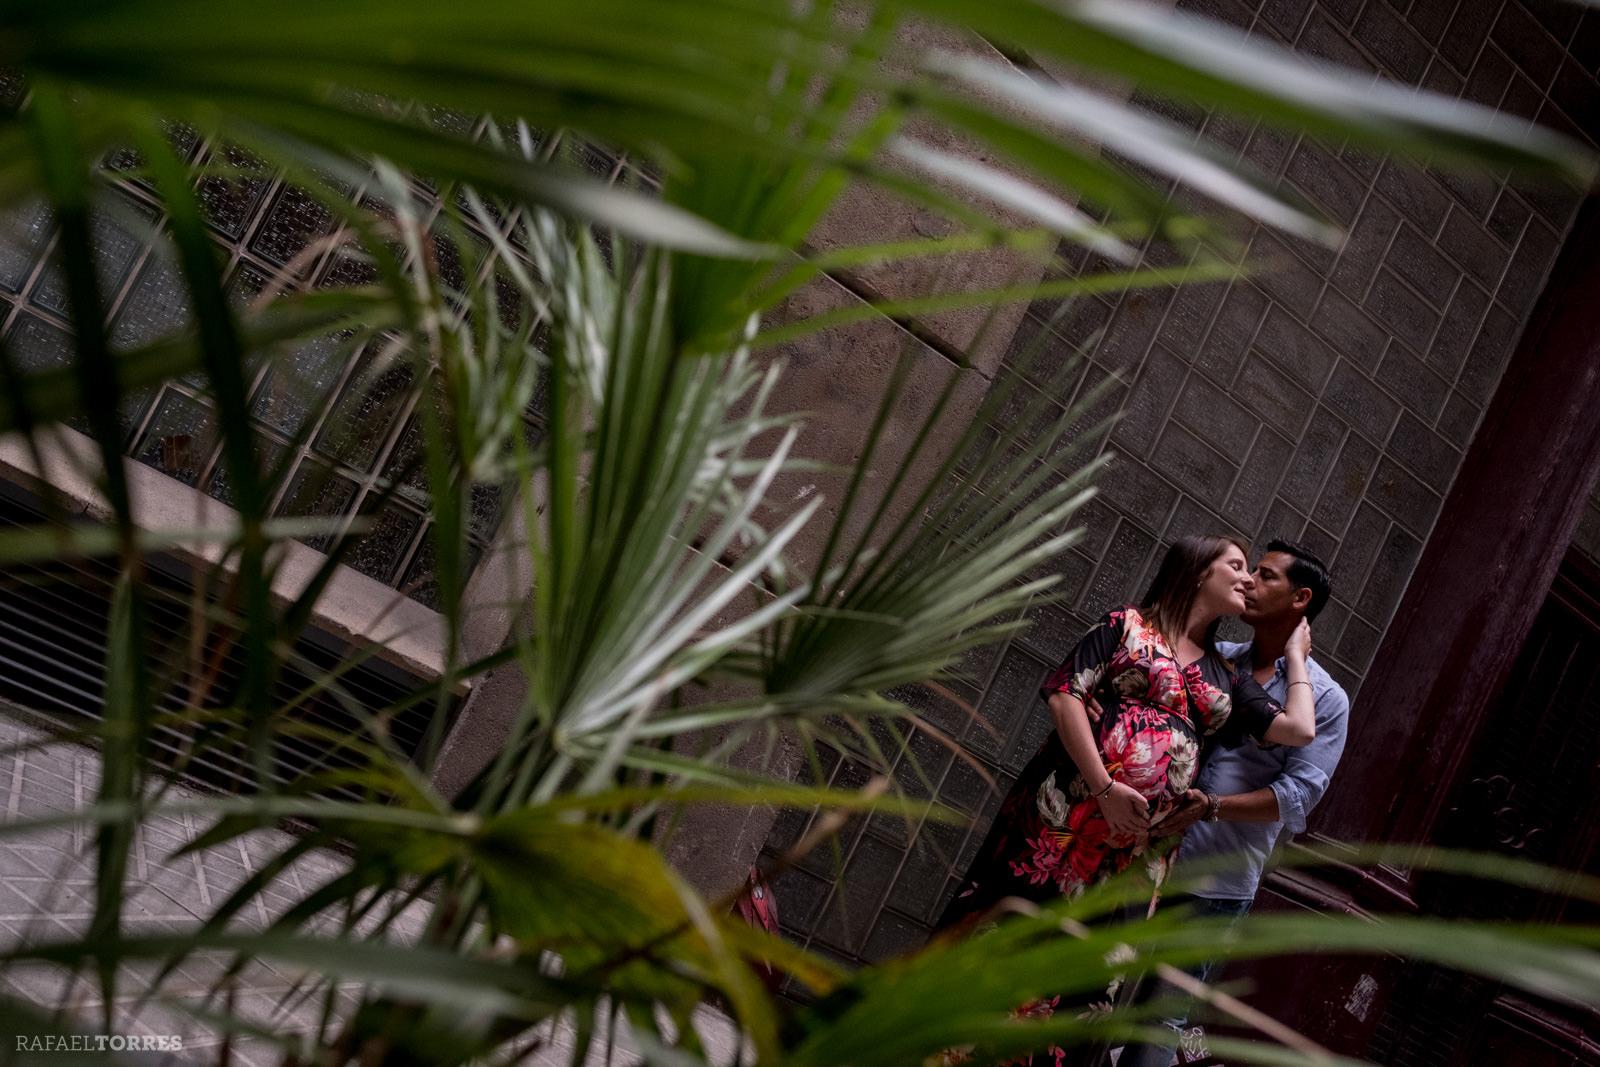 pregnant+Victor+Laura+Rafael+Torres+fotografo+bodas+sevilla+madrid+barcelona+wedding+photographer+bodas+diferentes+bodaensevilla+molinillos+fotografo+hacienda+oran+alfonso+wedding+photographer-9.jpg